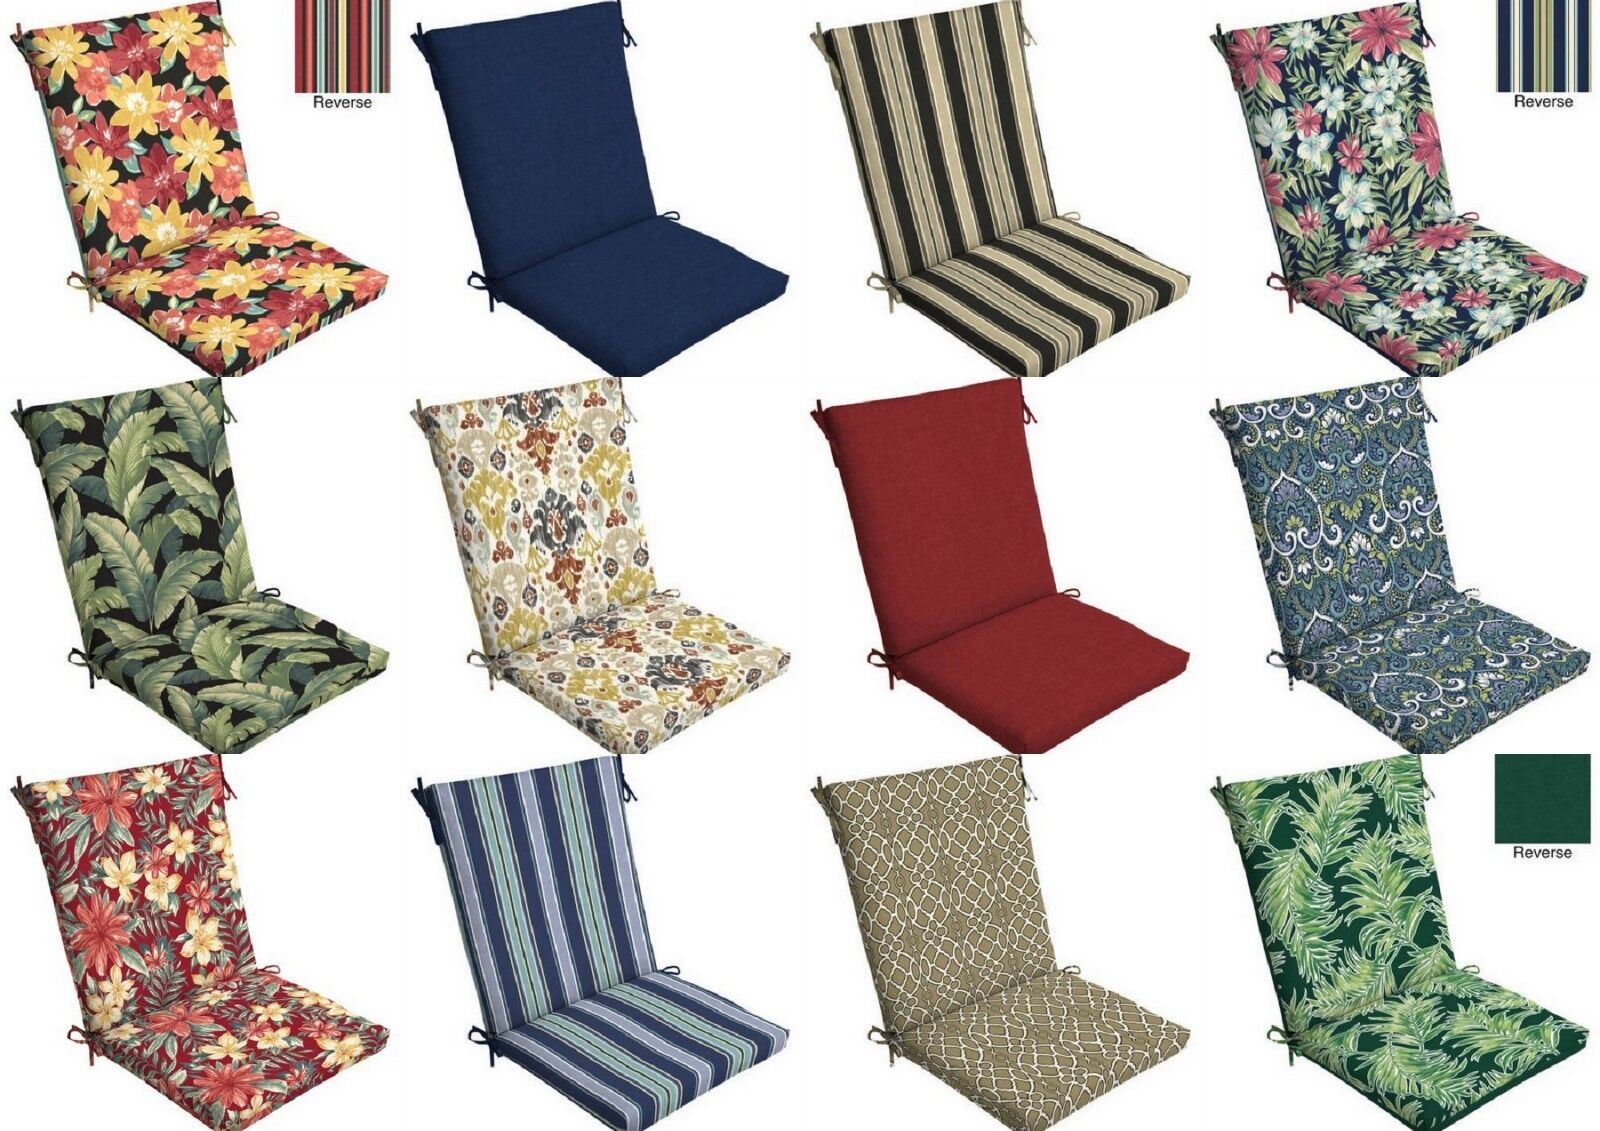 Garden Treasures 1 Piece High Back Patio Chair Cushion For Sale